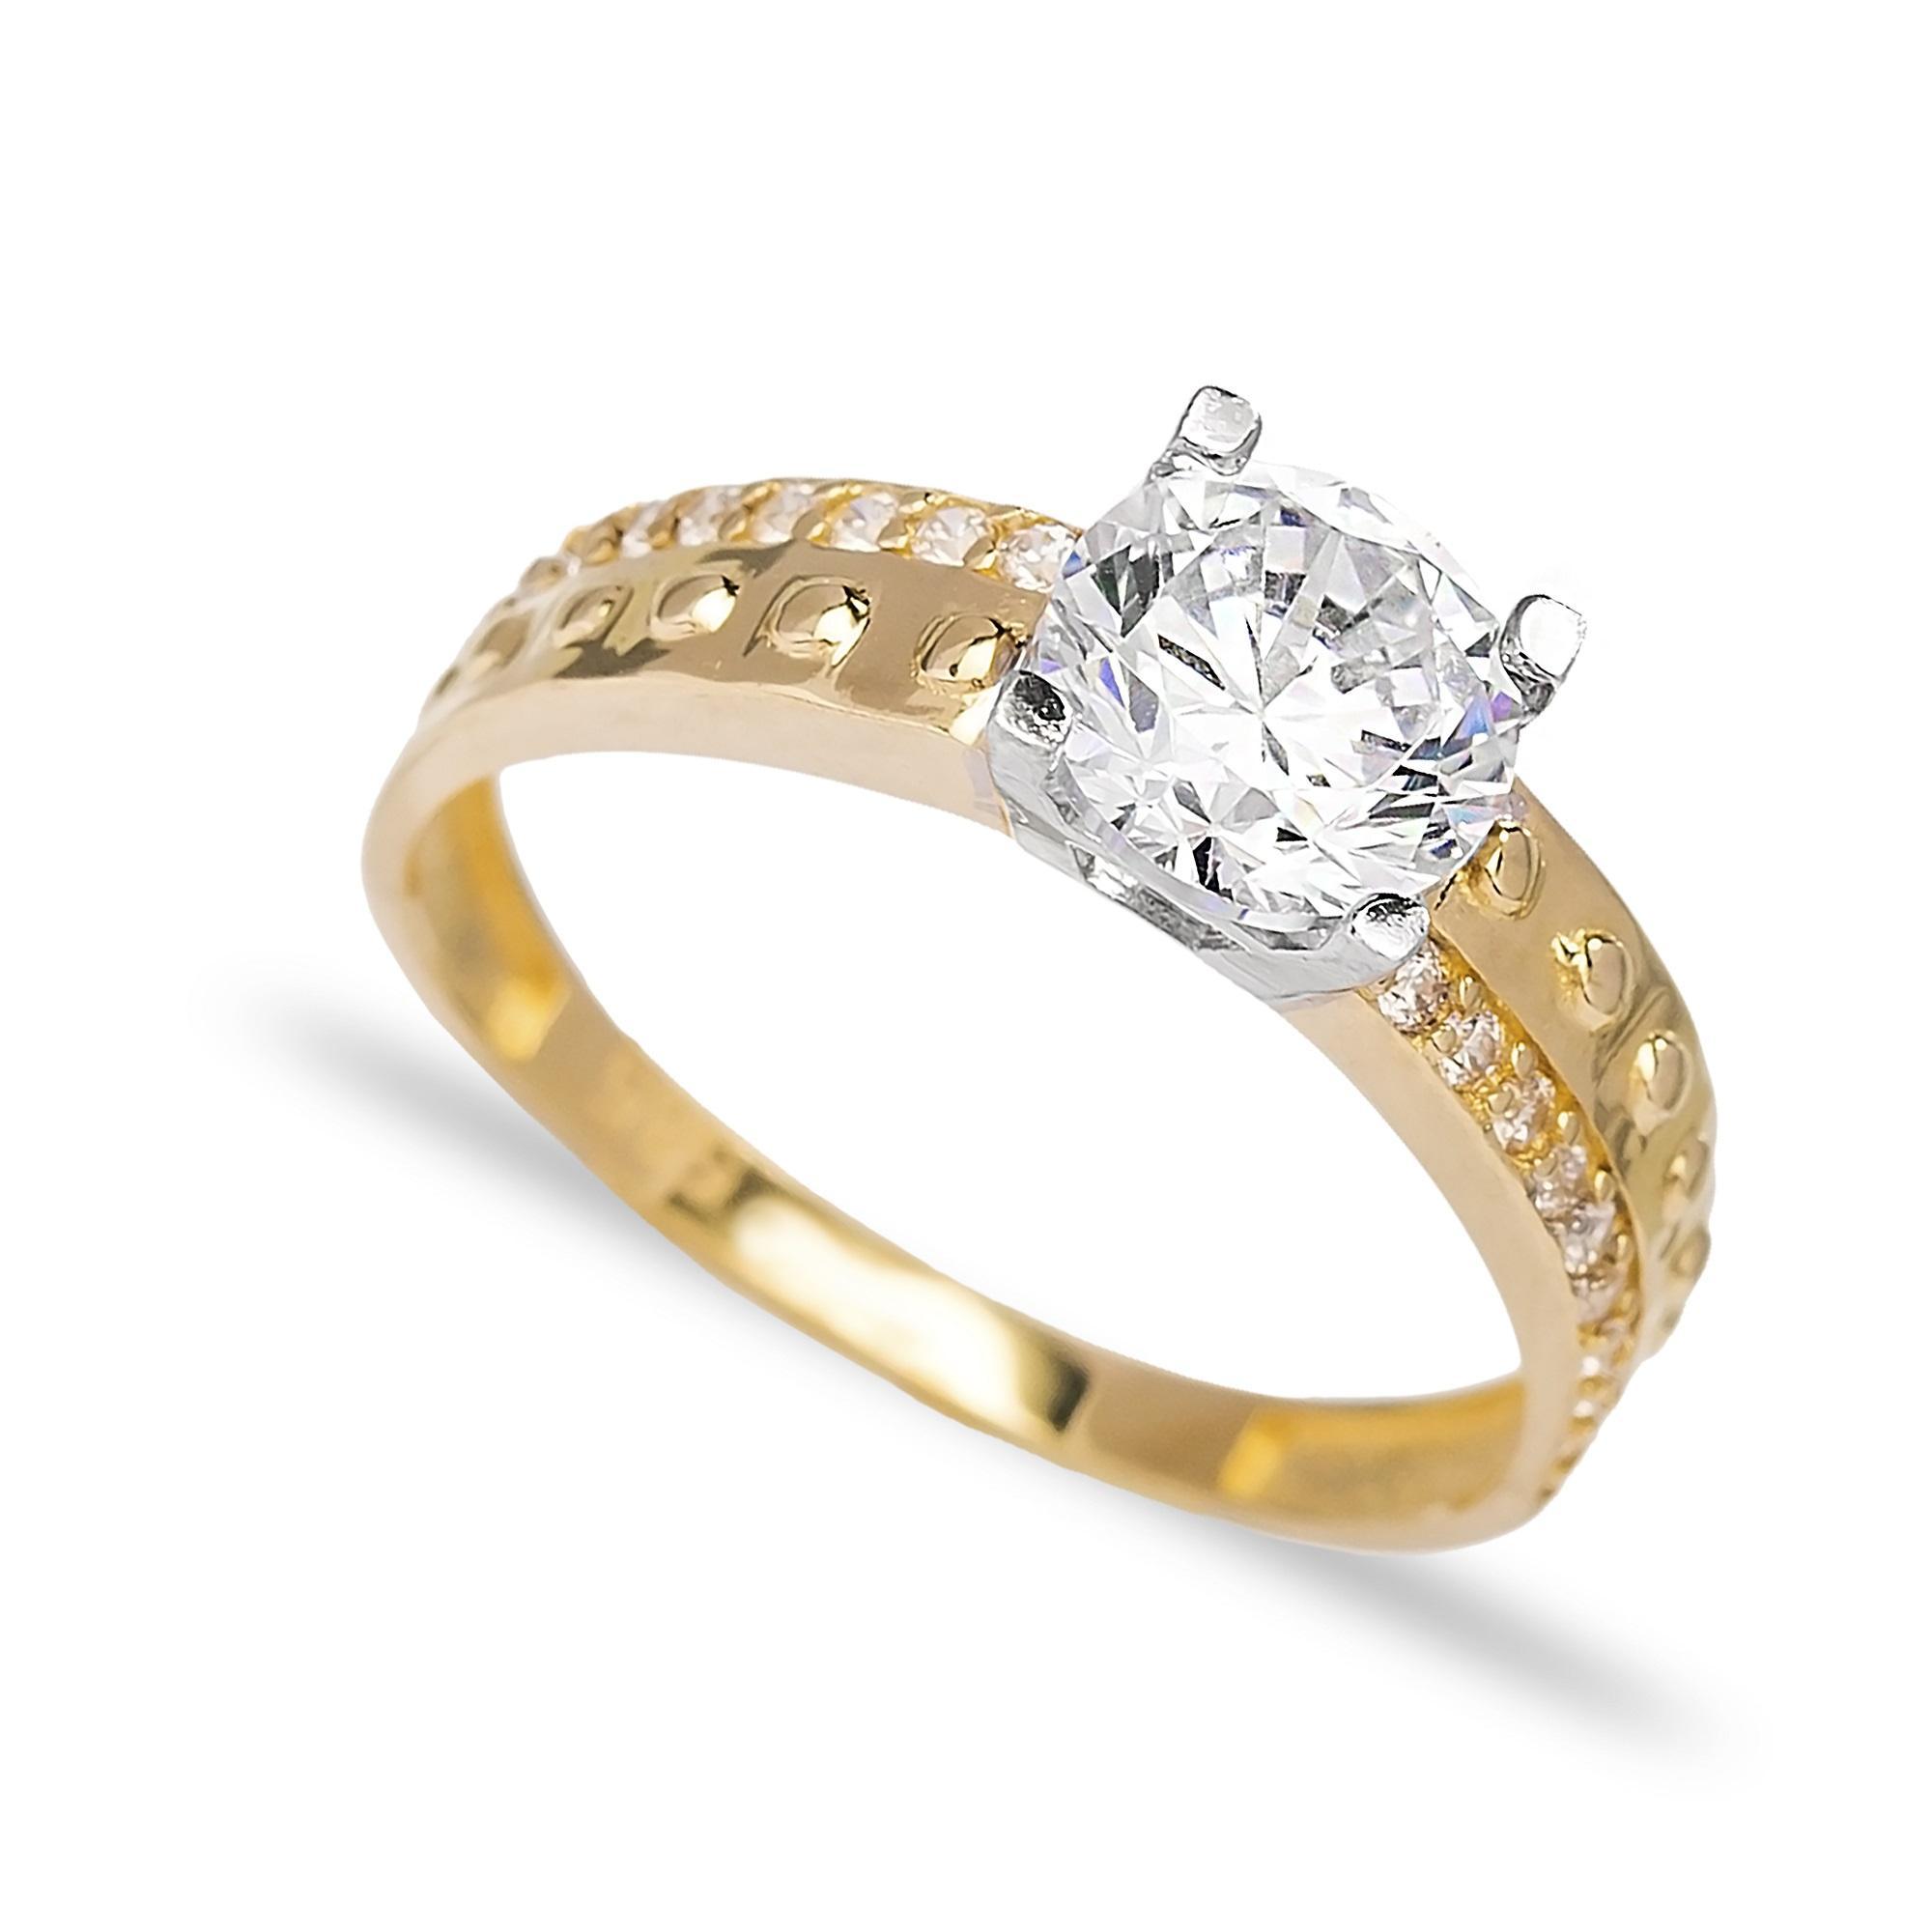 Engagement Solitaire 14 Karat Gold Zirconia 6.5mm Wholesale Handmade Turkish Jewelry